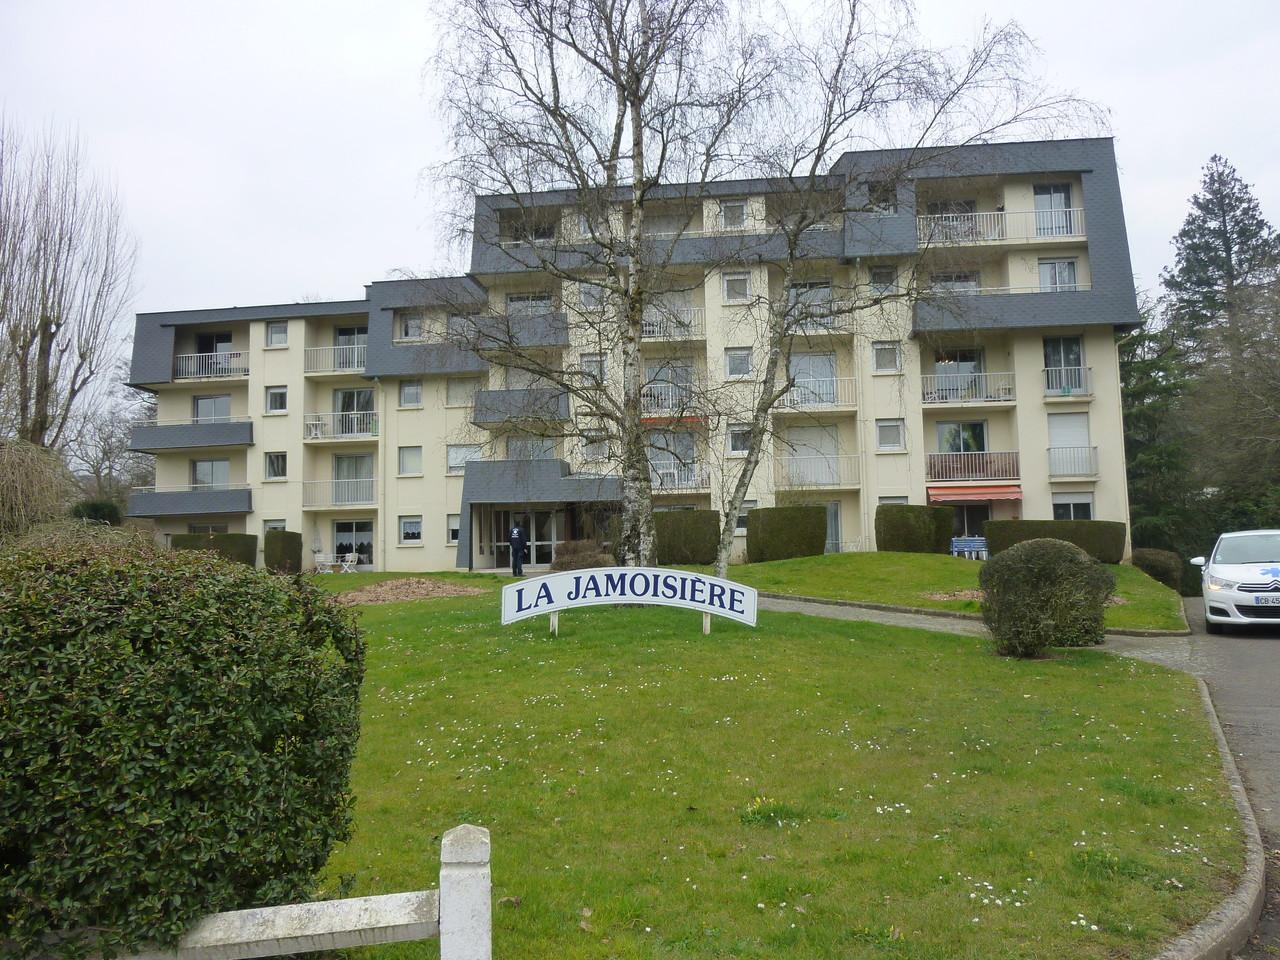 Notre résidence 2013